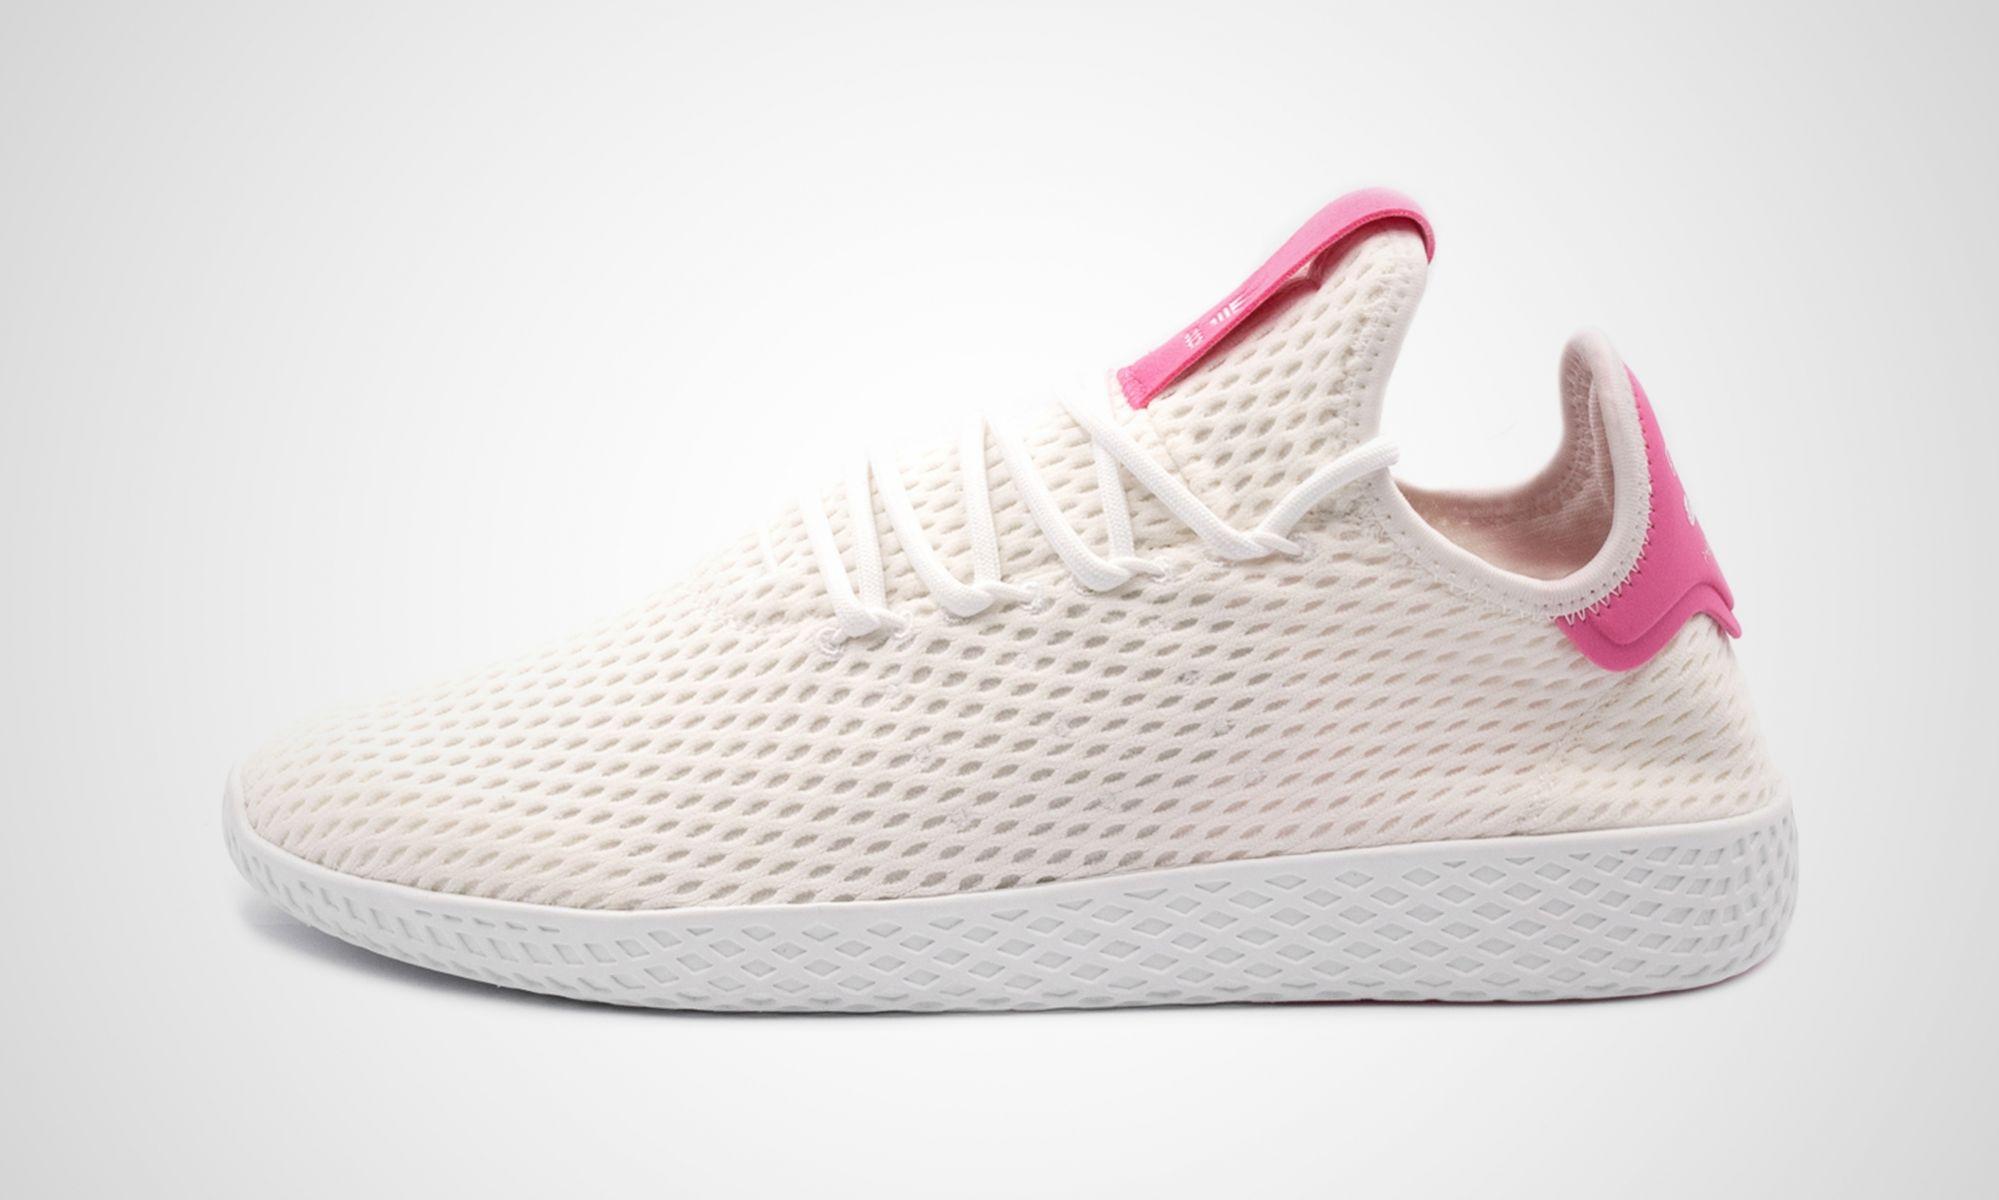 adidas Tennis HU weiß pink by Pharrell Williams | Alle